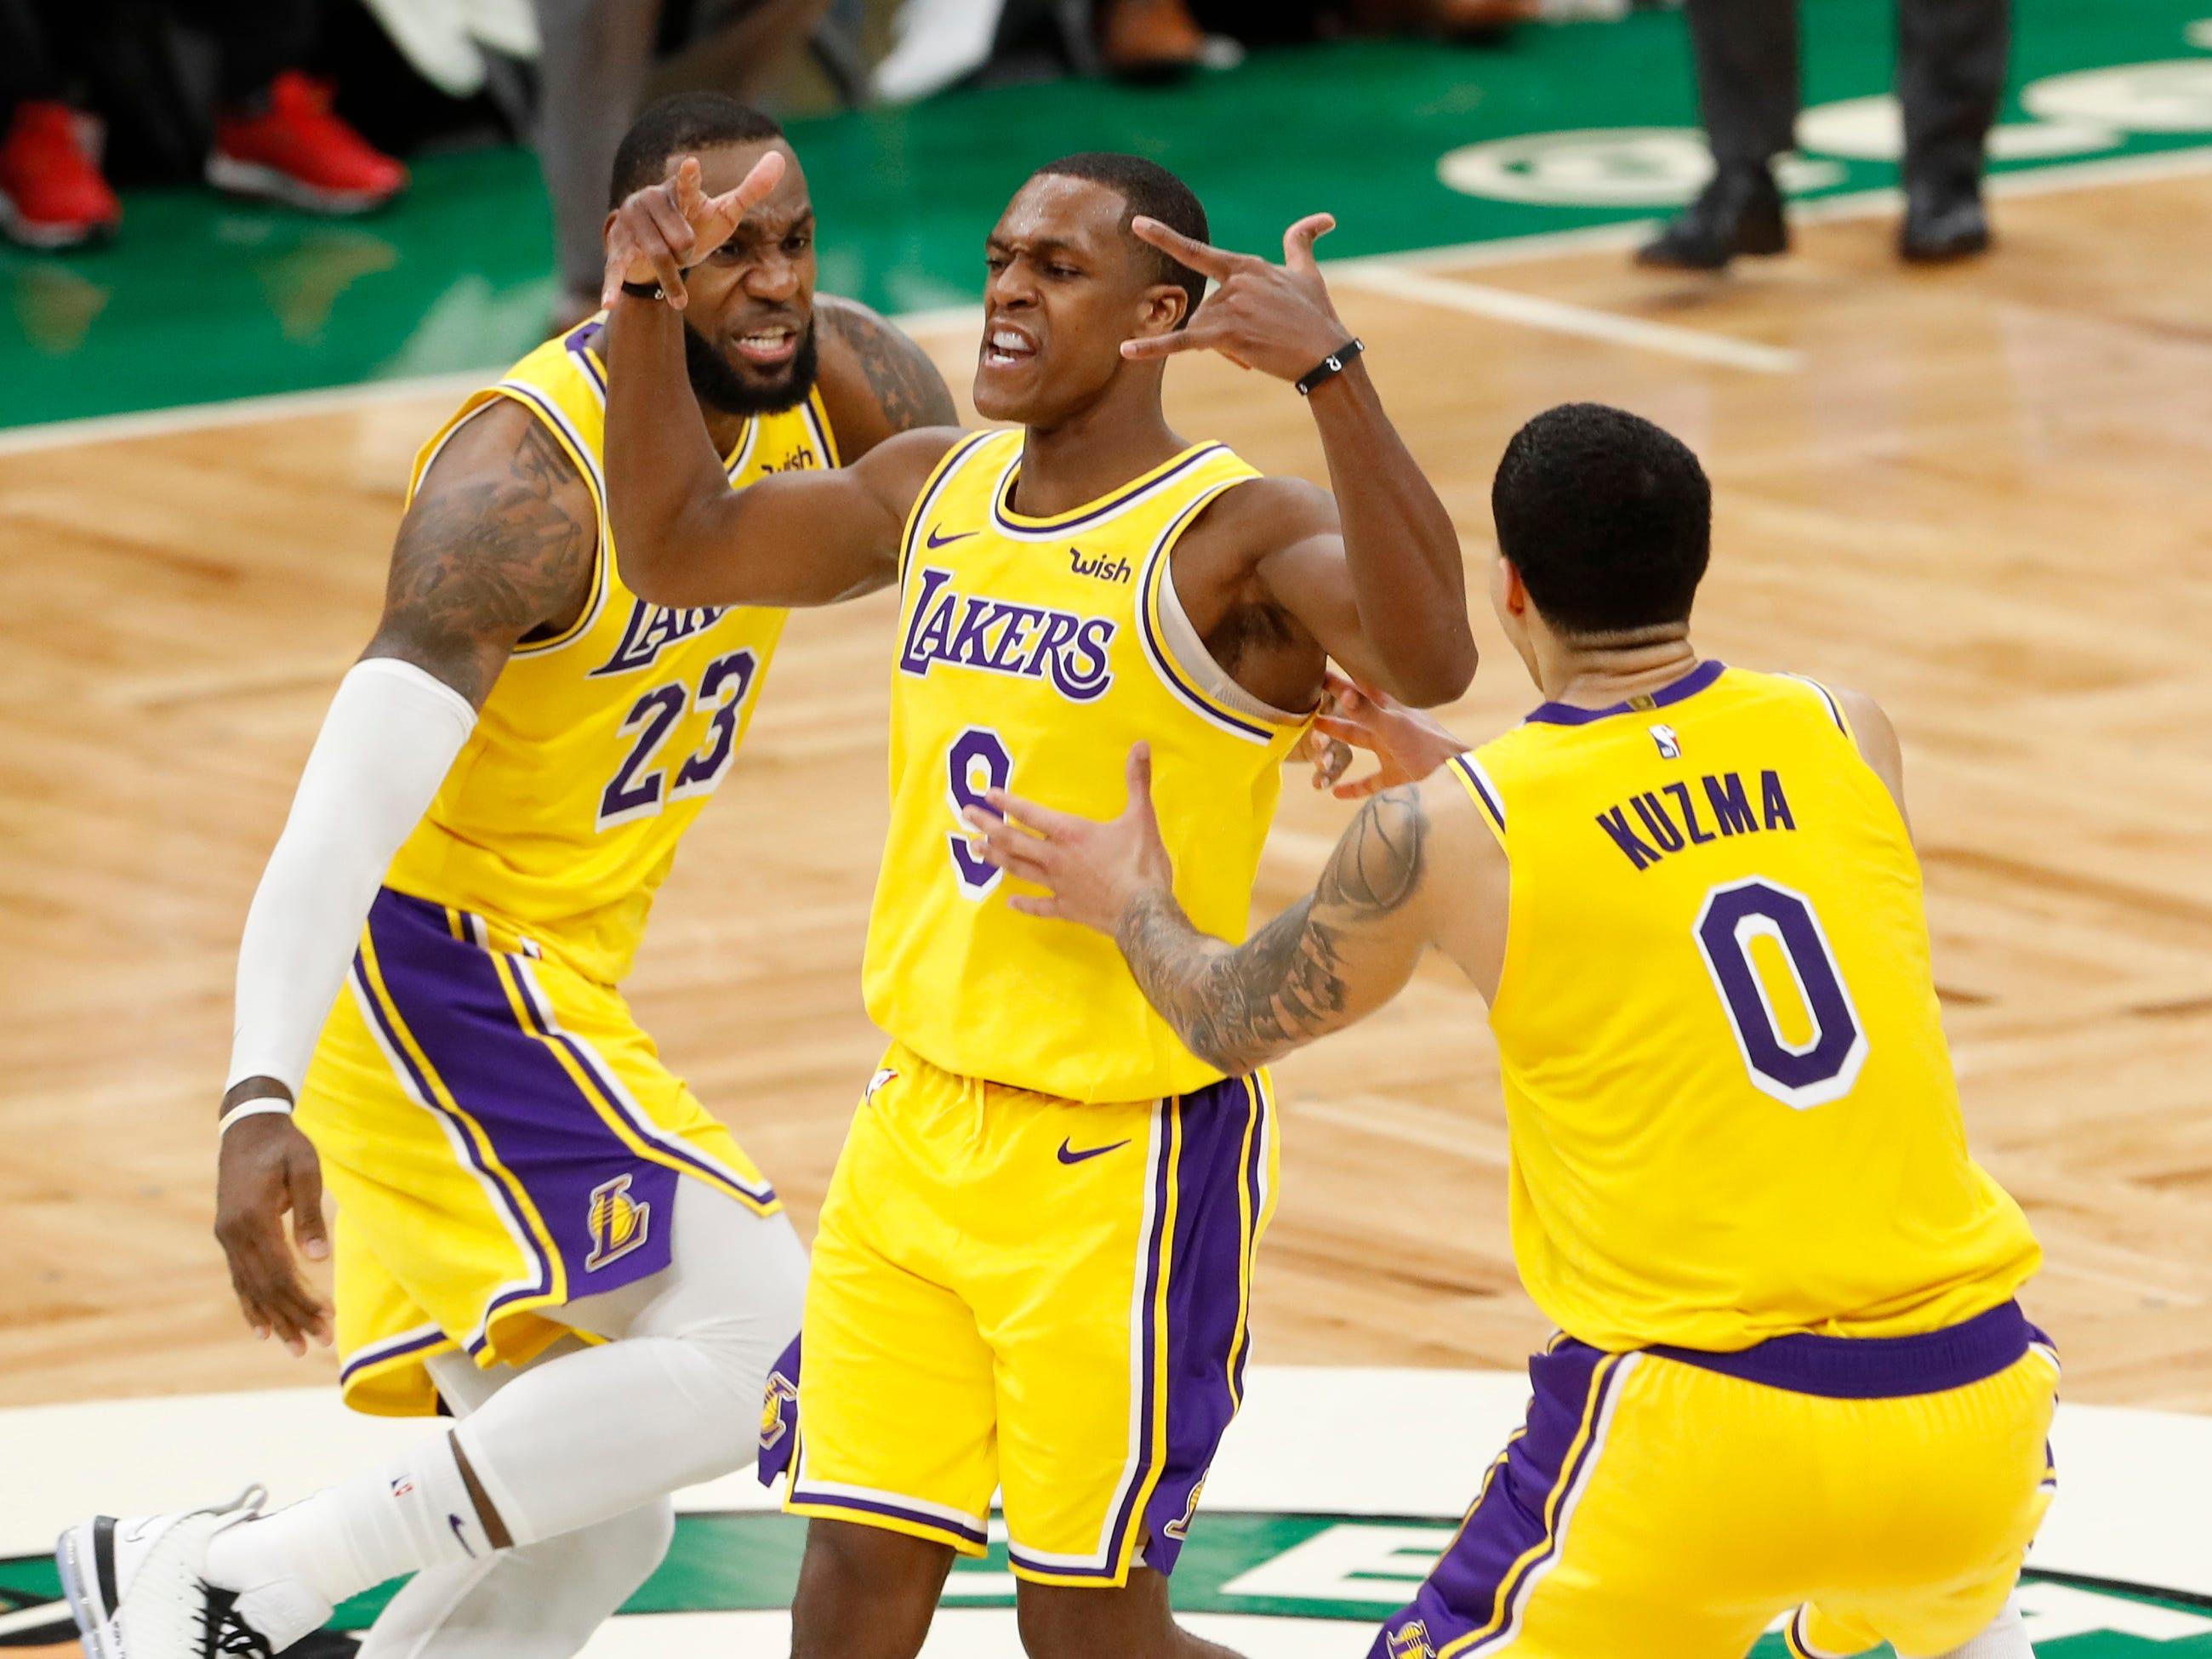 Feb. 7: Rajon Rondo celebrates his game-winning basket against the Boston Celtics at TD Garden. The LA Lakers won the game, 129-128.